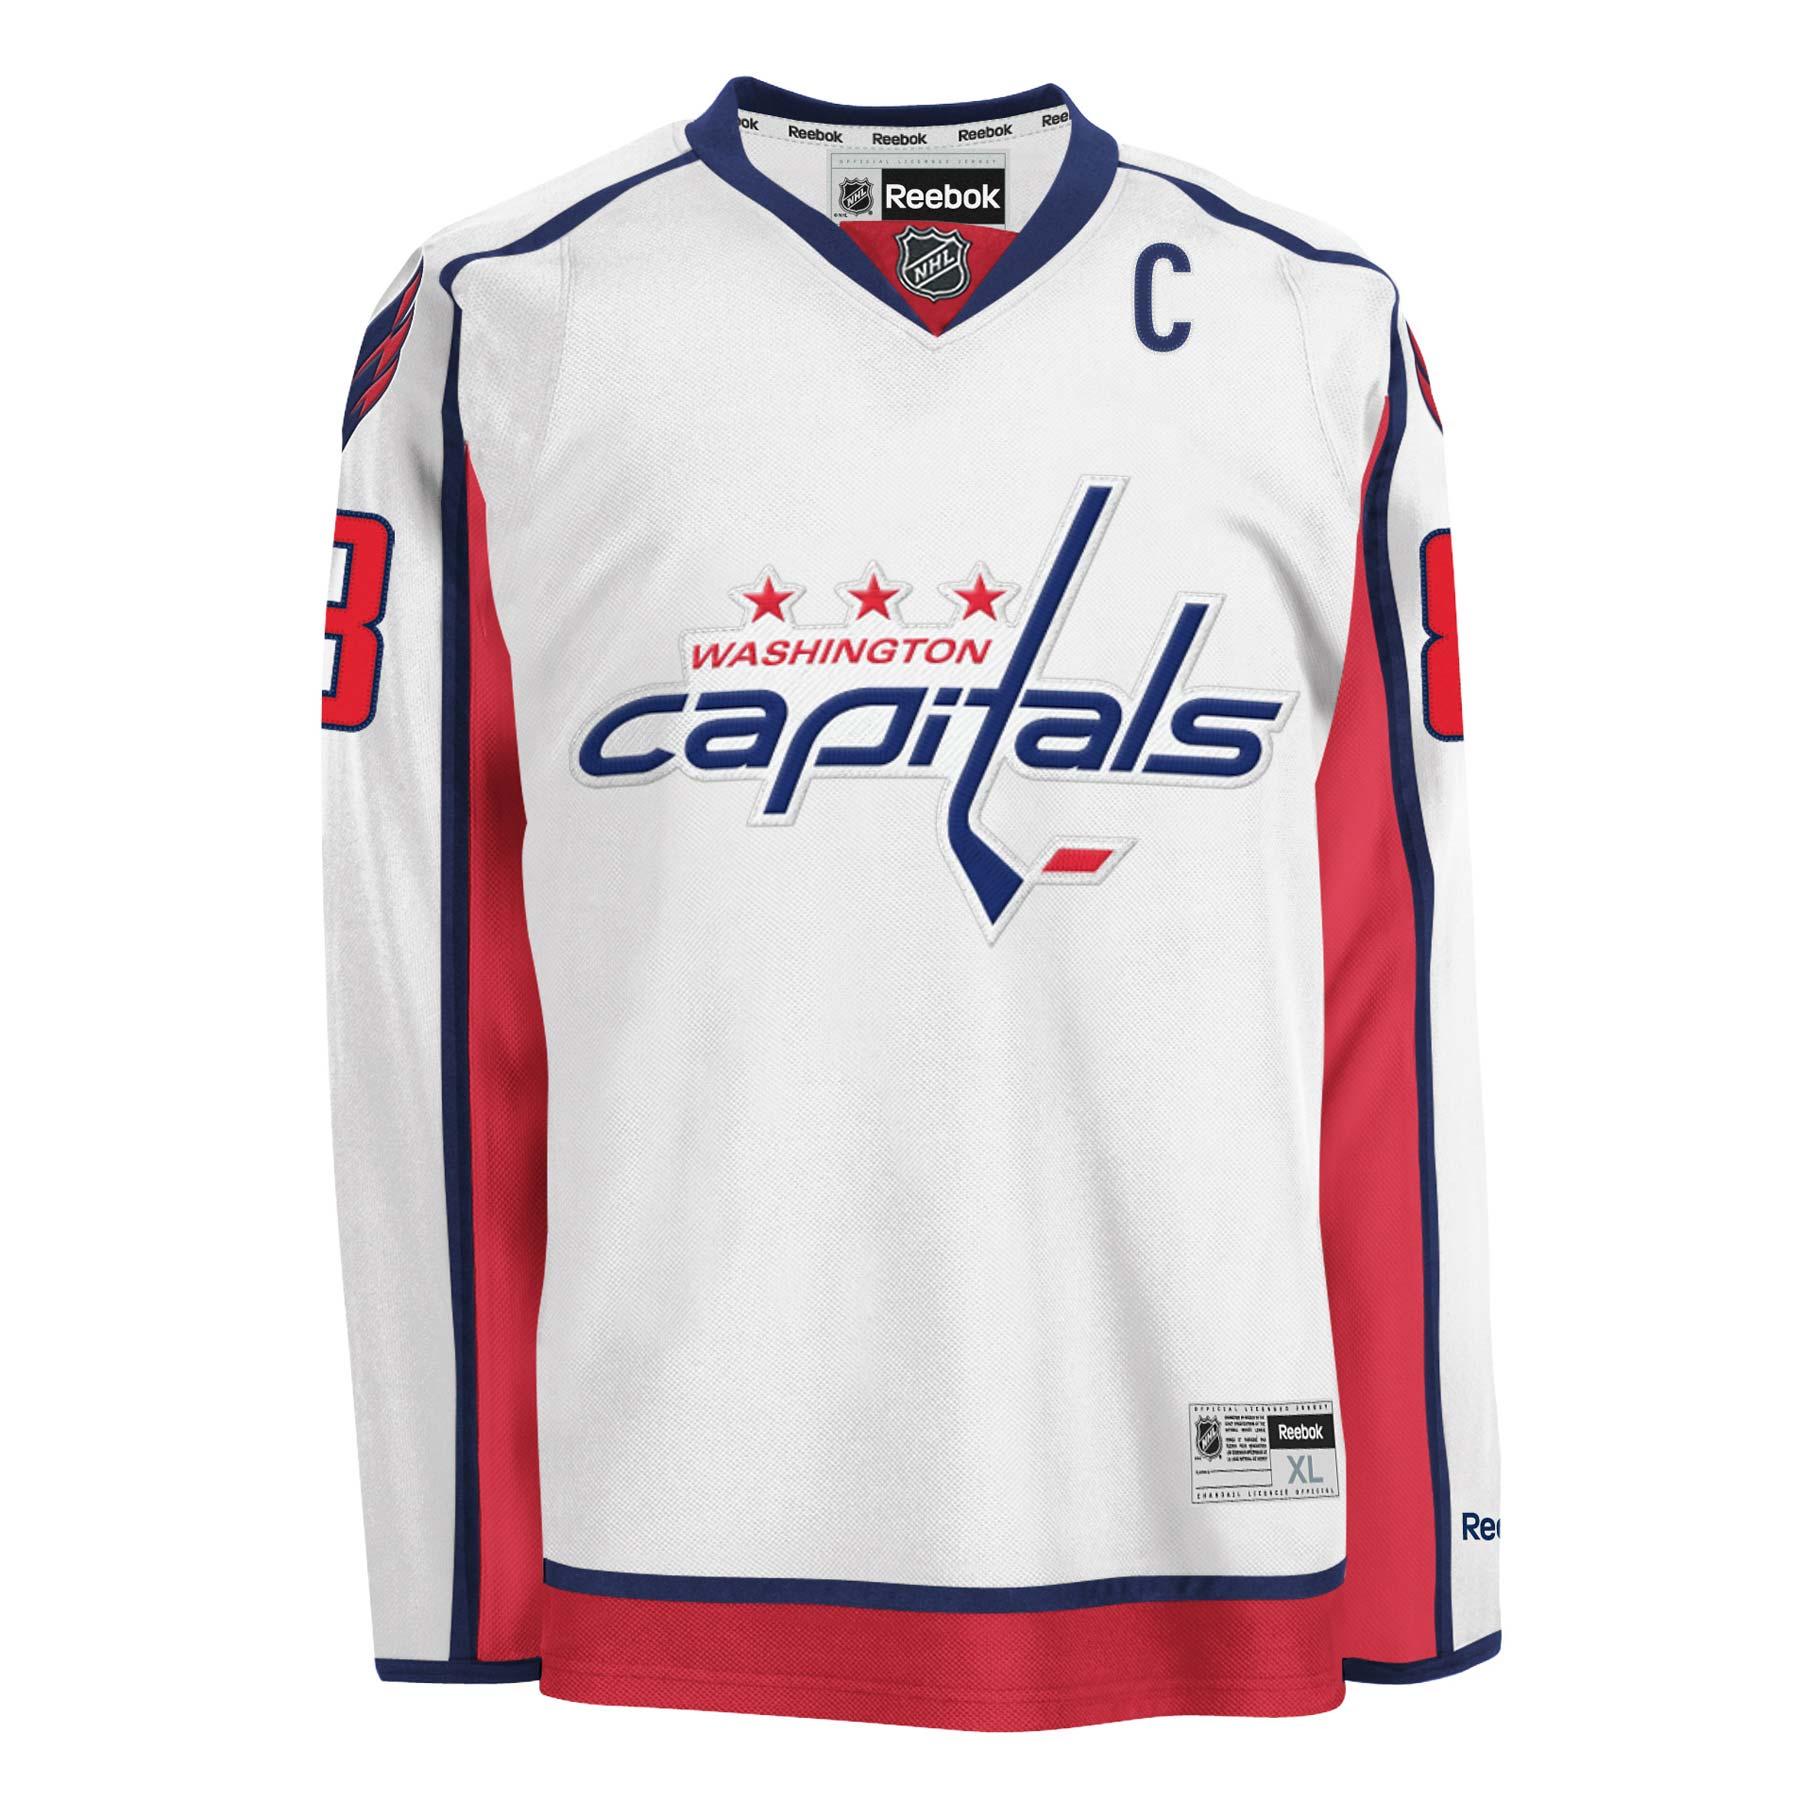 new product dc18a 0ec3e Reebok Washington Capitals jersey 8 Alexander Ovechkin hockey NHL men's XL